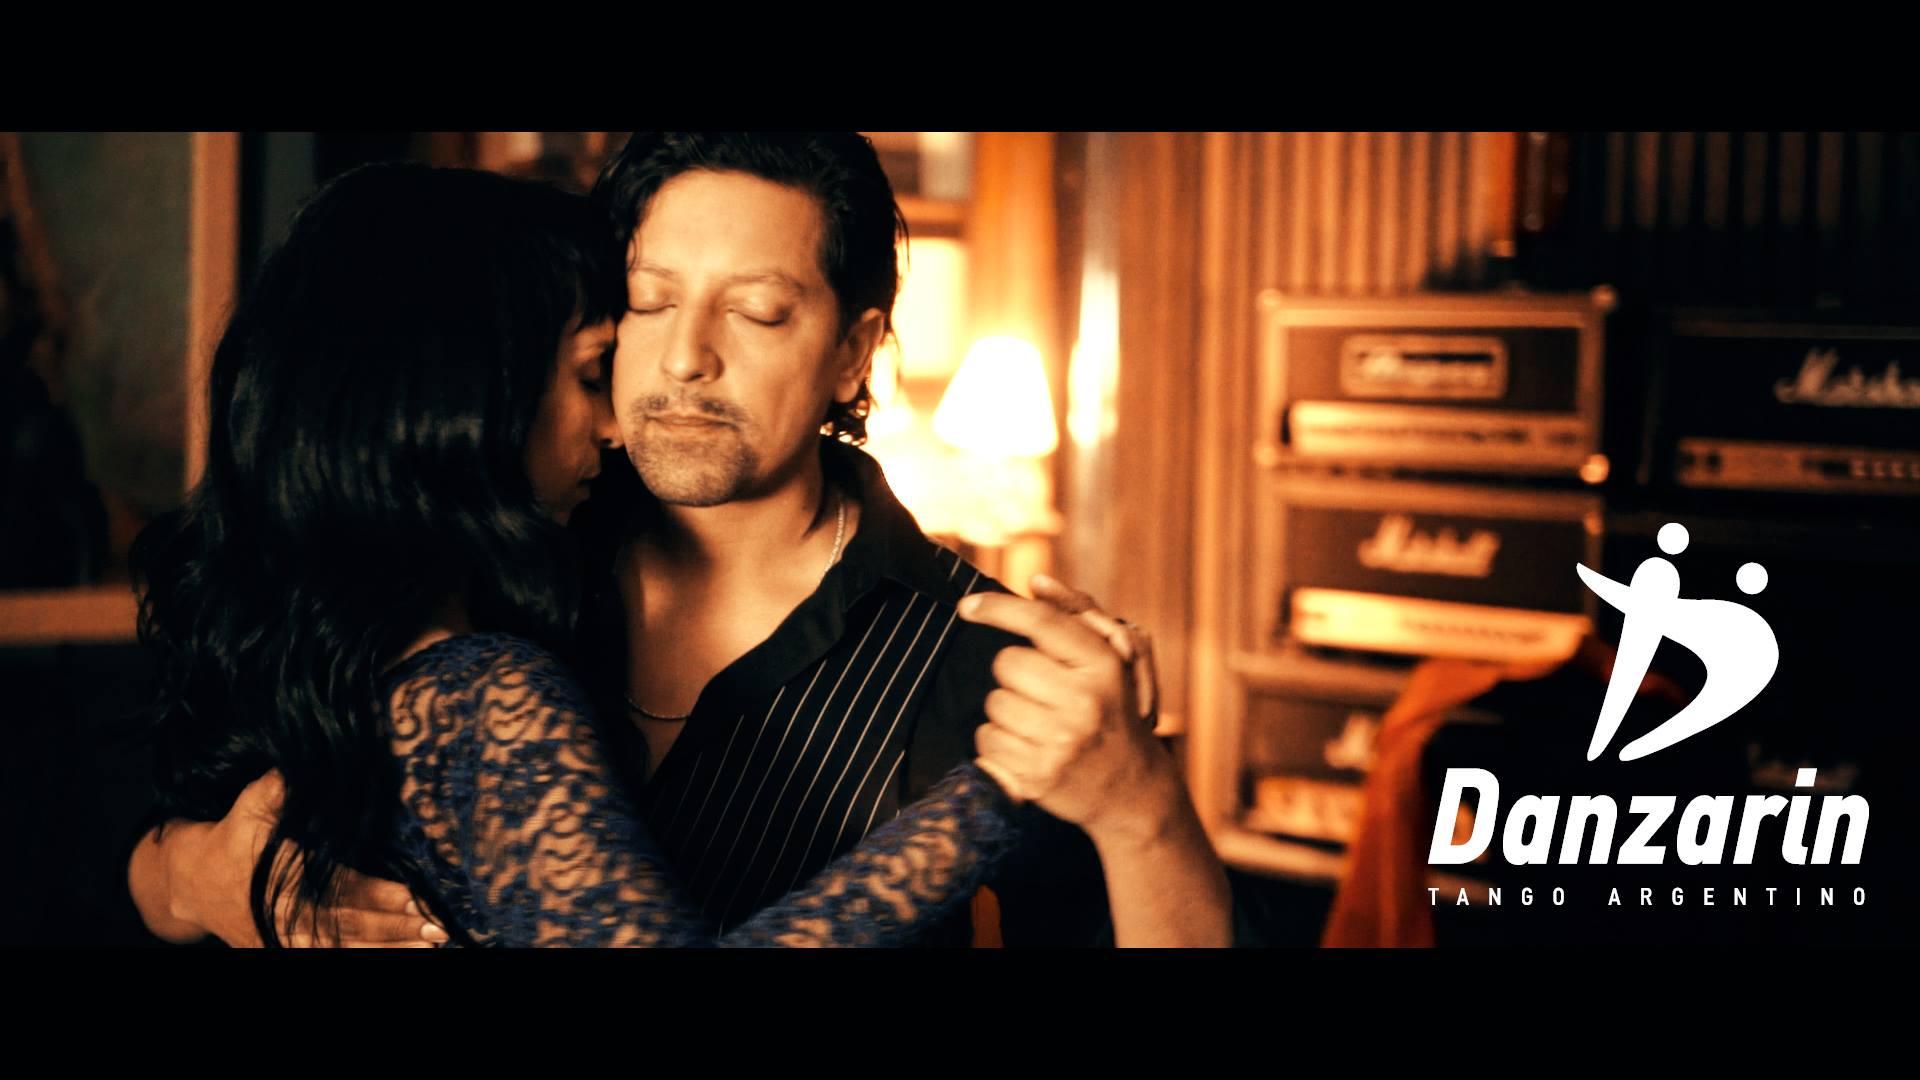 Danzarin - Μαθήματα Αργεντίνικου Tango